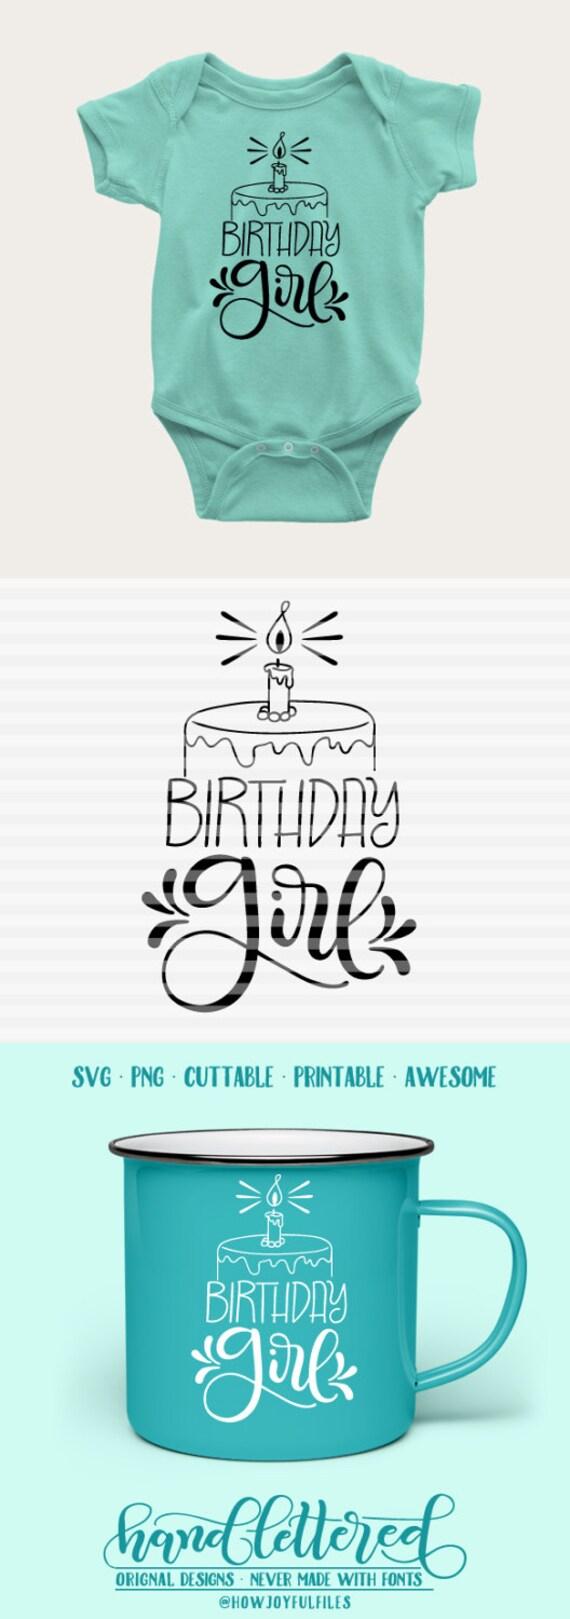 Birthday Girl Svg Dxf Pdf Files Hand Drawn Lettered Etsy